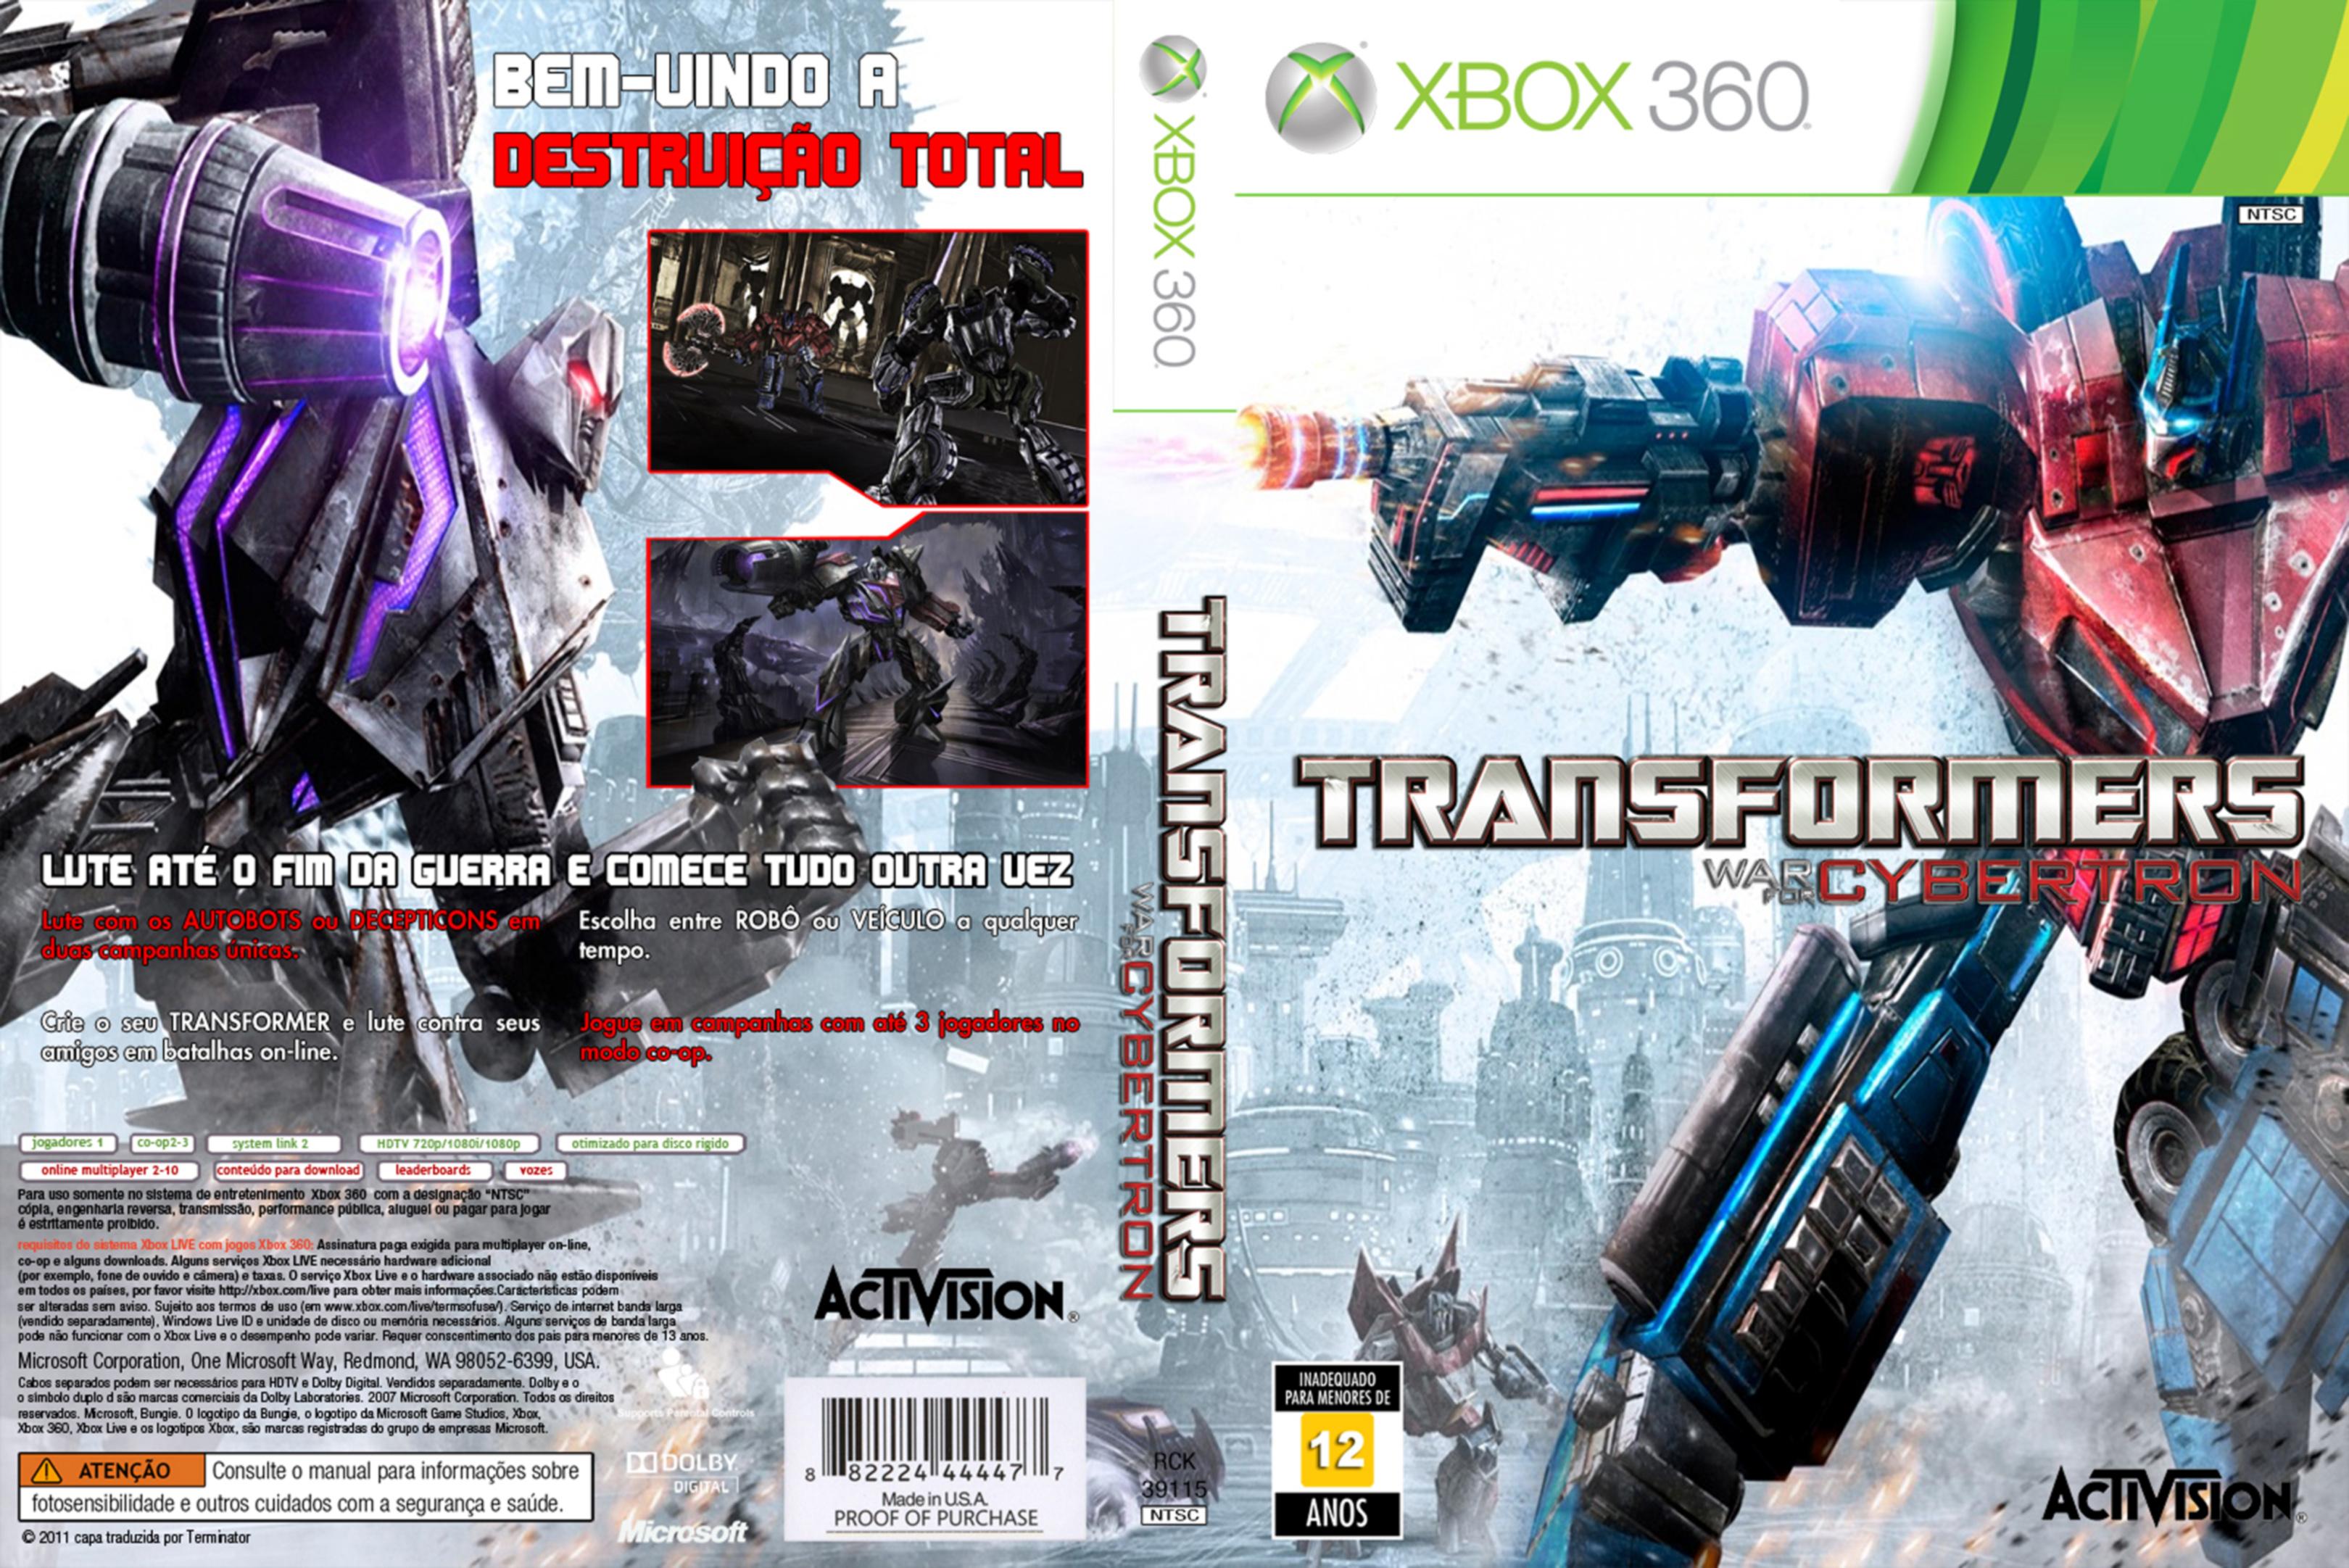 TransformersWarForCybertron